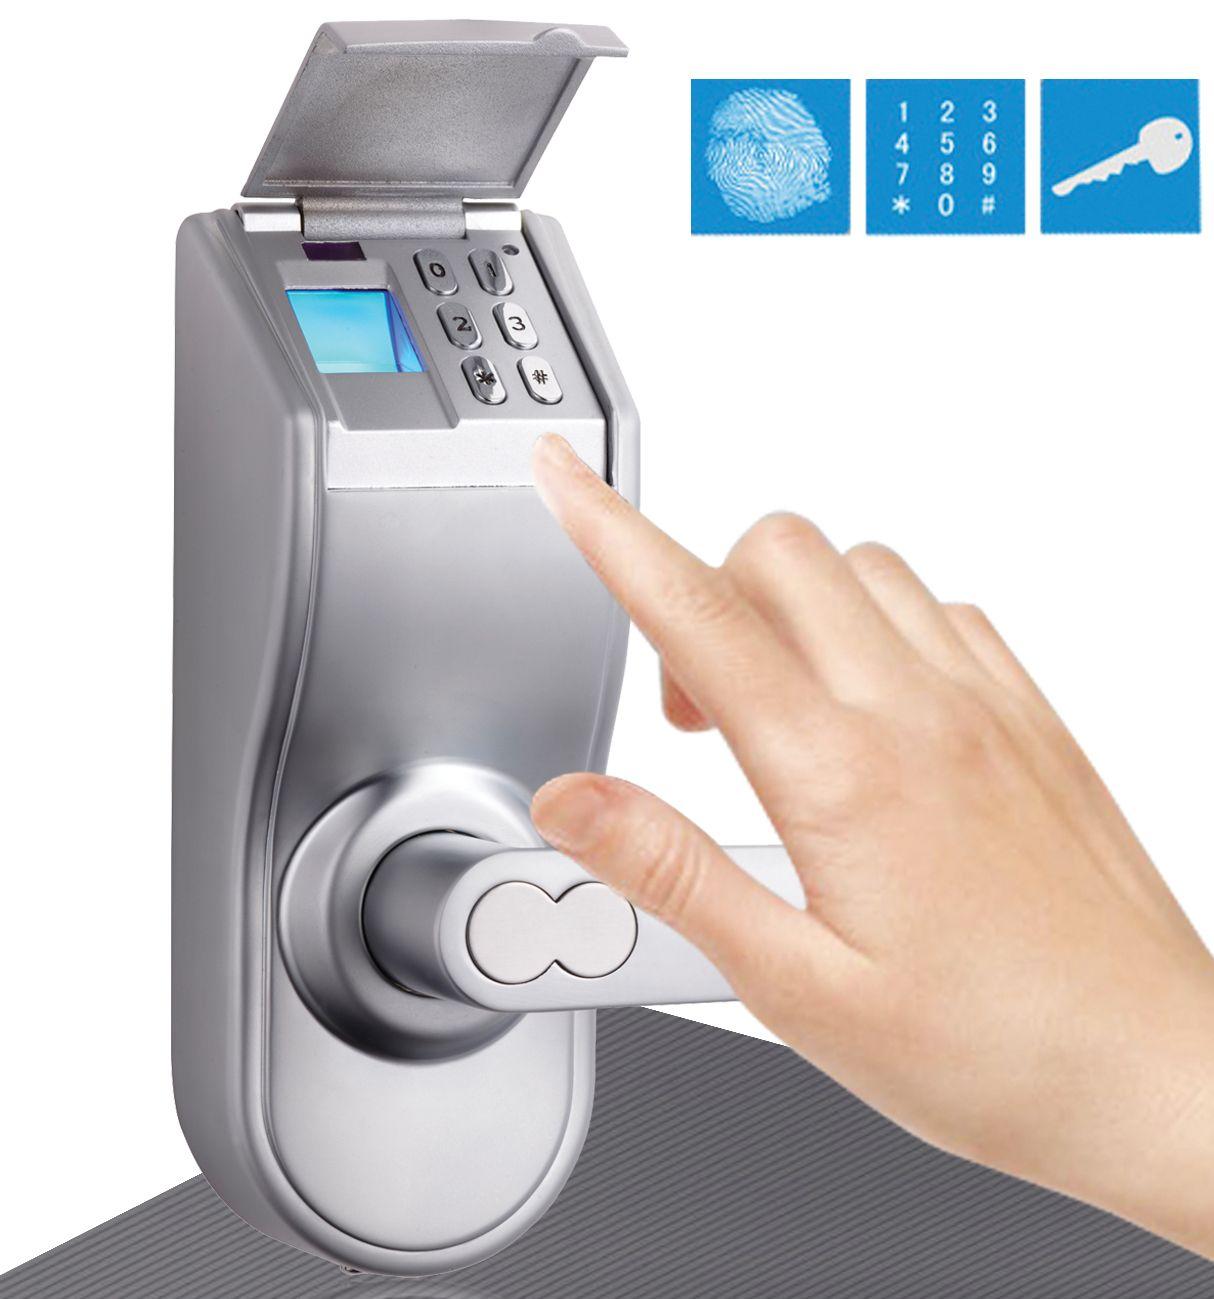 online cheap assa abloy digi digital electronic keypad door u0026 fingerprint door lock keylock 97 satin chrome right lever handle by digilock